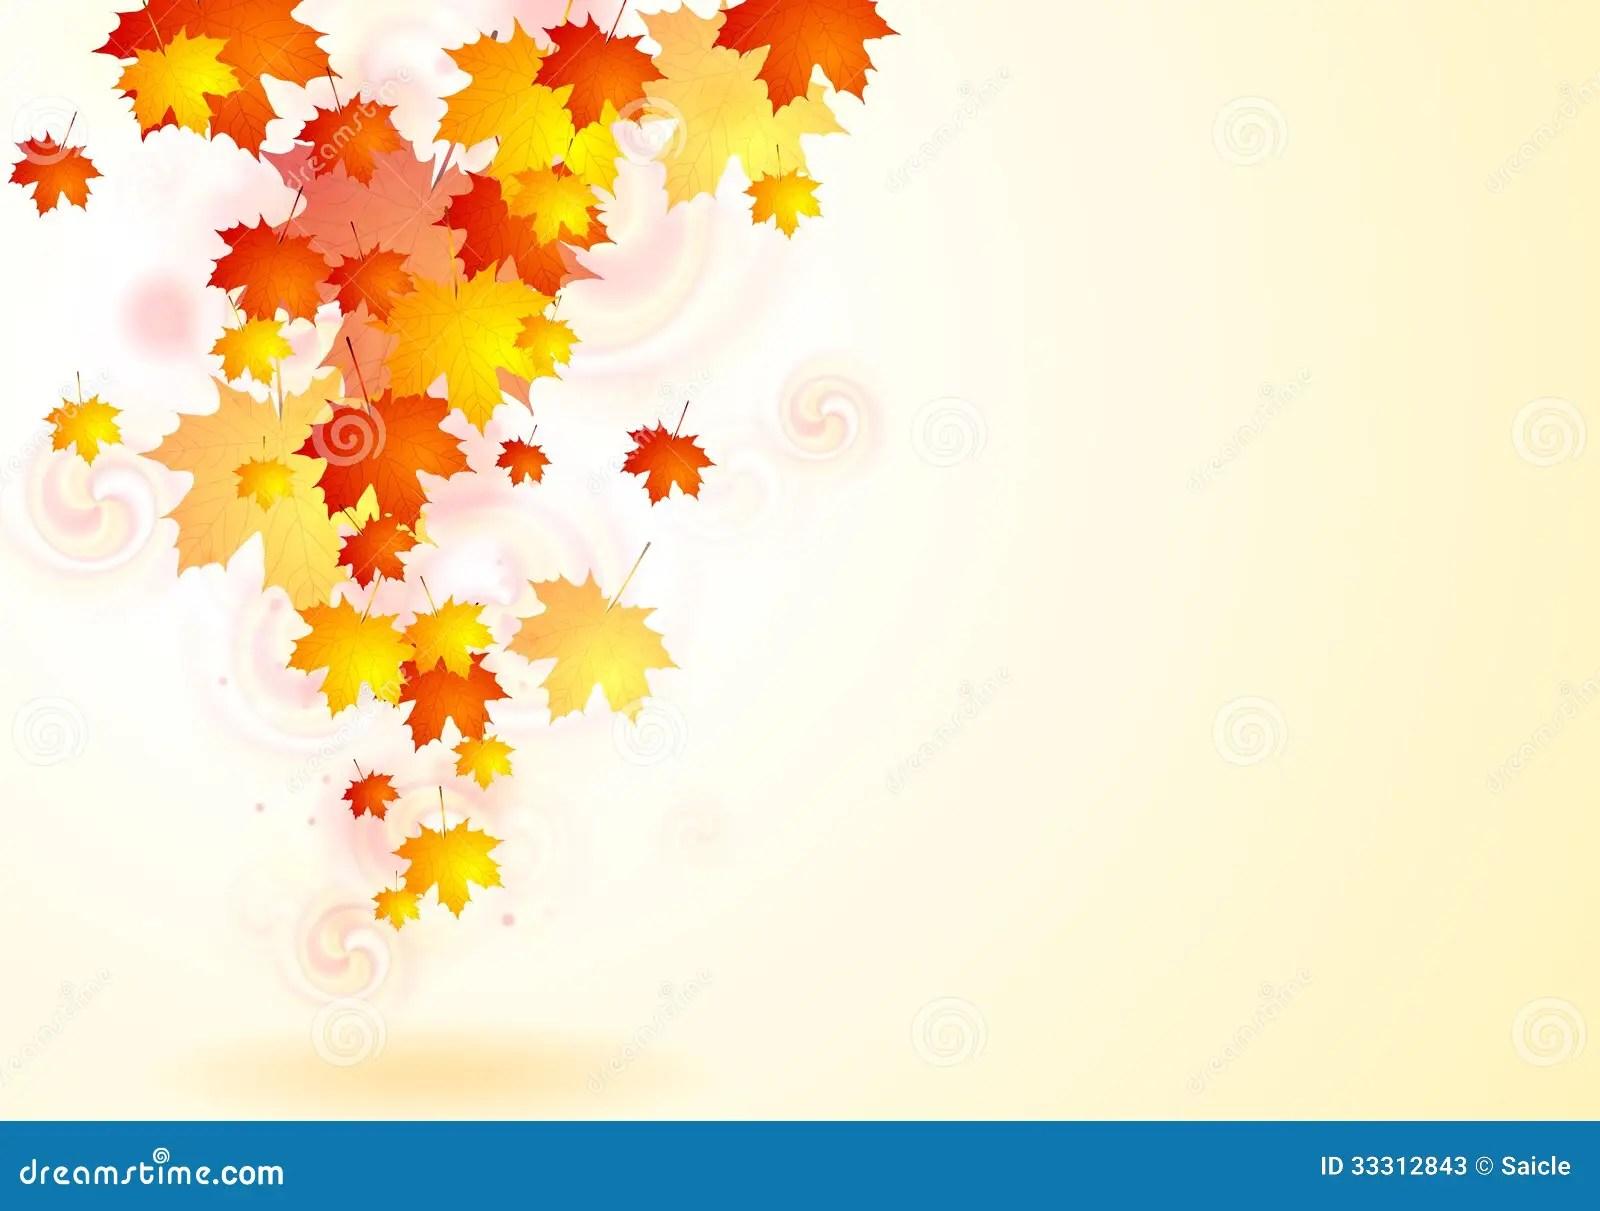 Falling Maple Leaves Wallpaper Elegant Vector Autumn Background Stock Photos Image